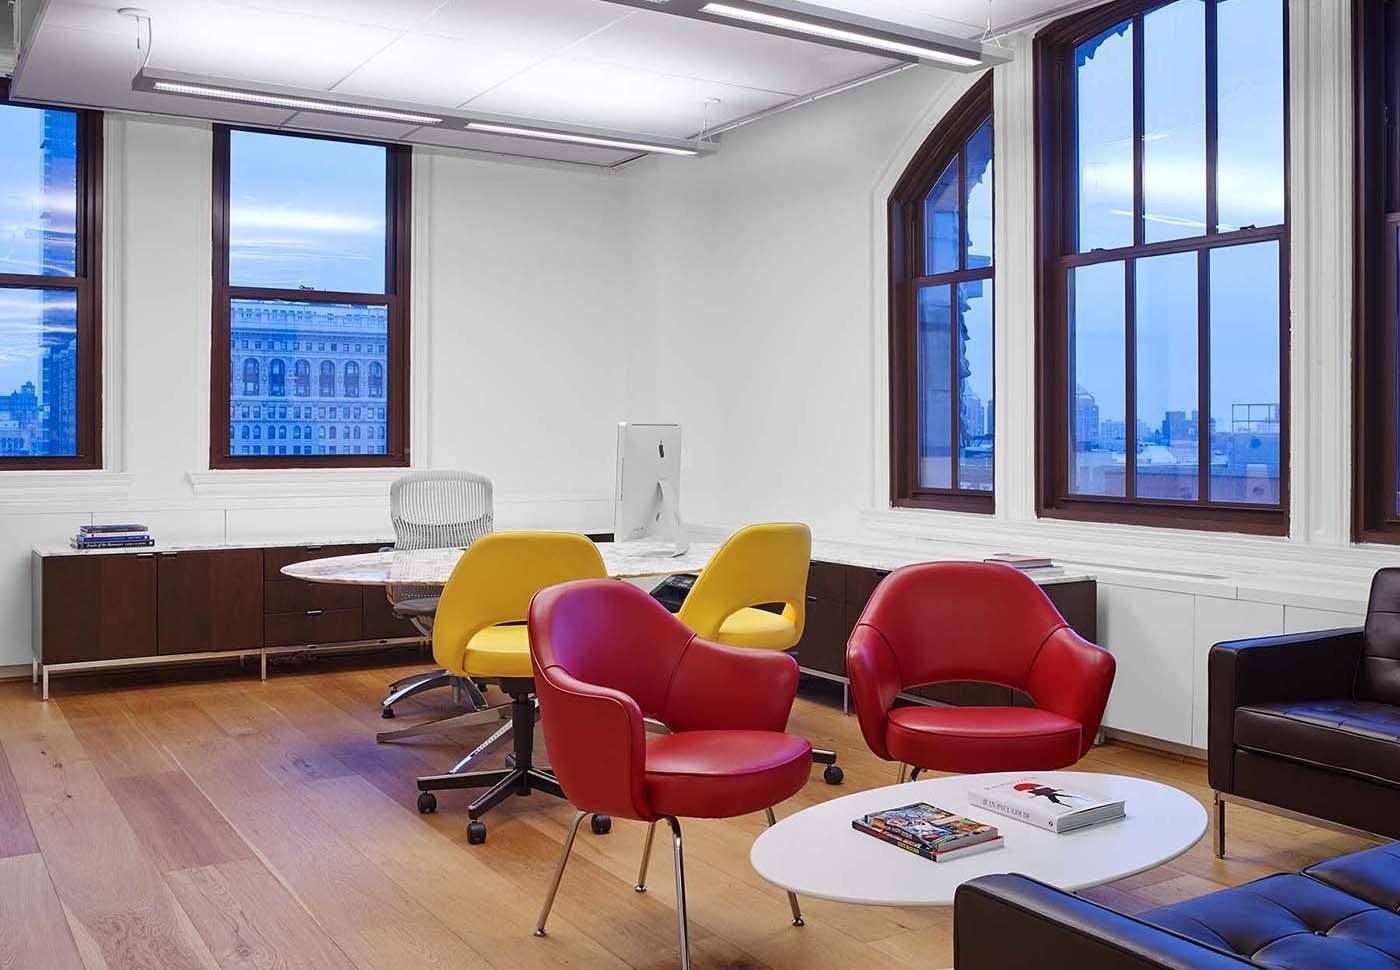 Take a Tour of BrainPOP's New York City Headquarters